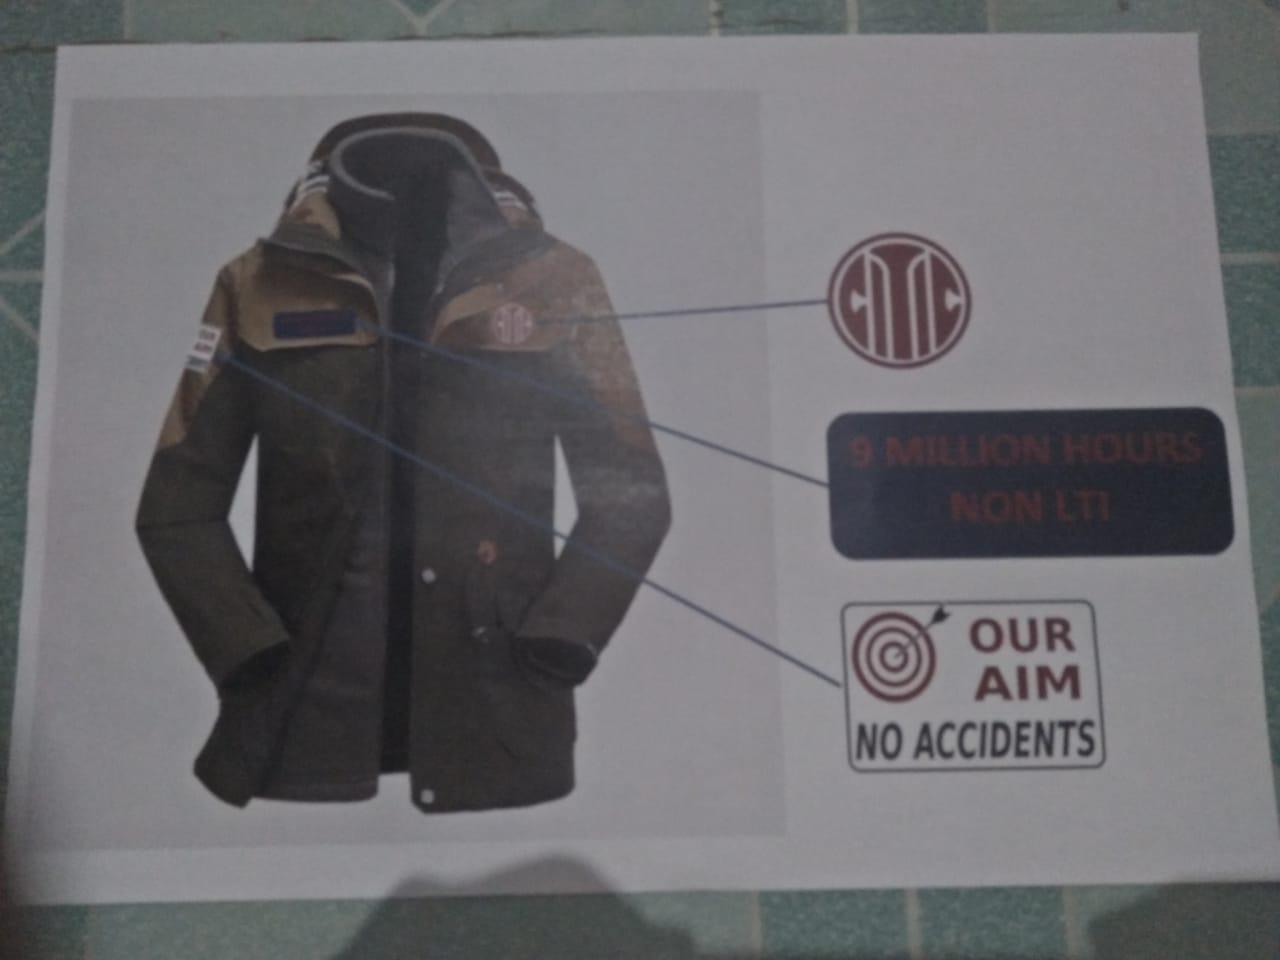 model jaket taktis army outdoor bahan taslan berkualitas murah bandung